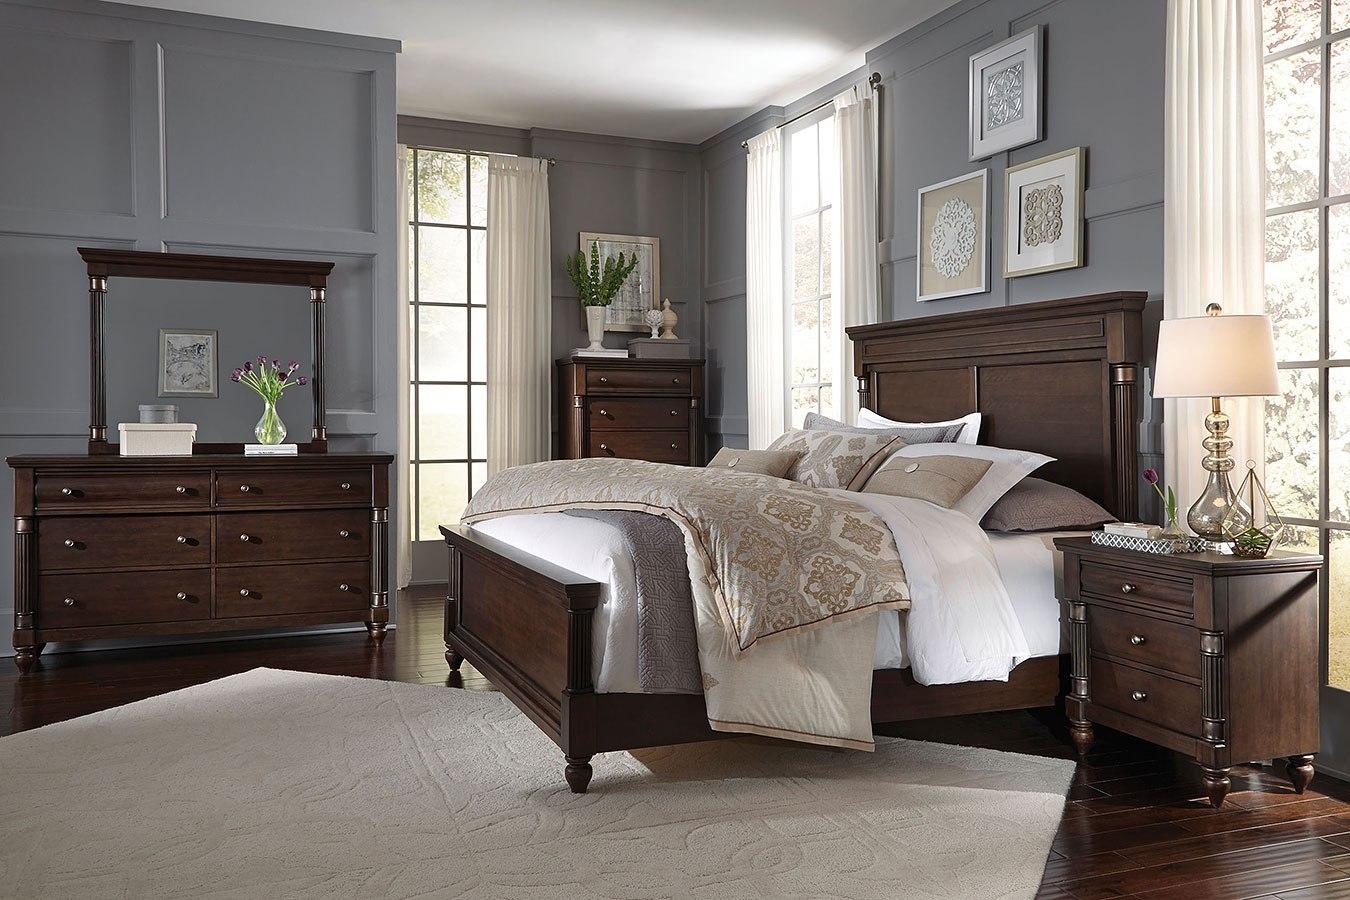 oxford panel bedroom set standard furniture furniture cart. Black Bedroom Furniture Sets. Home Design Ideas